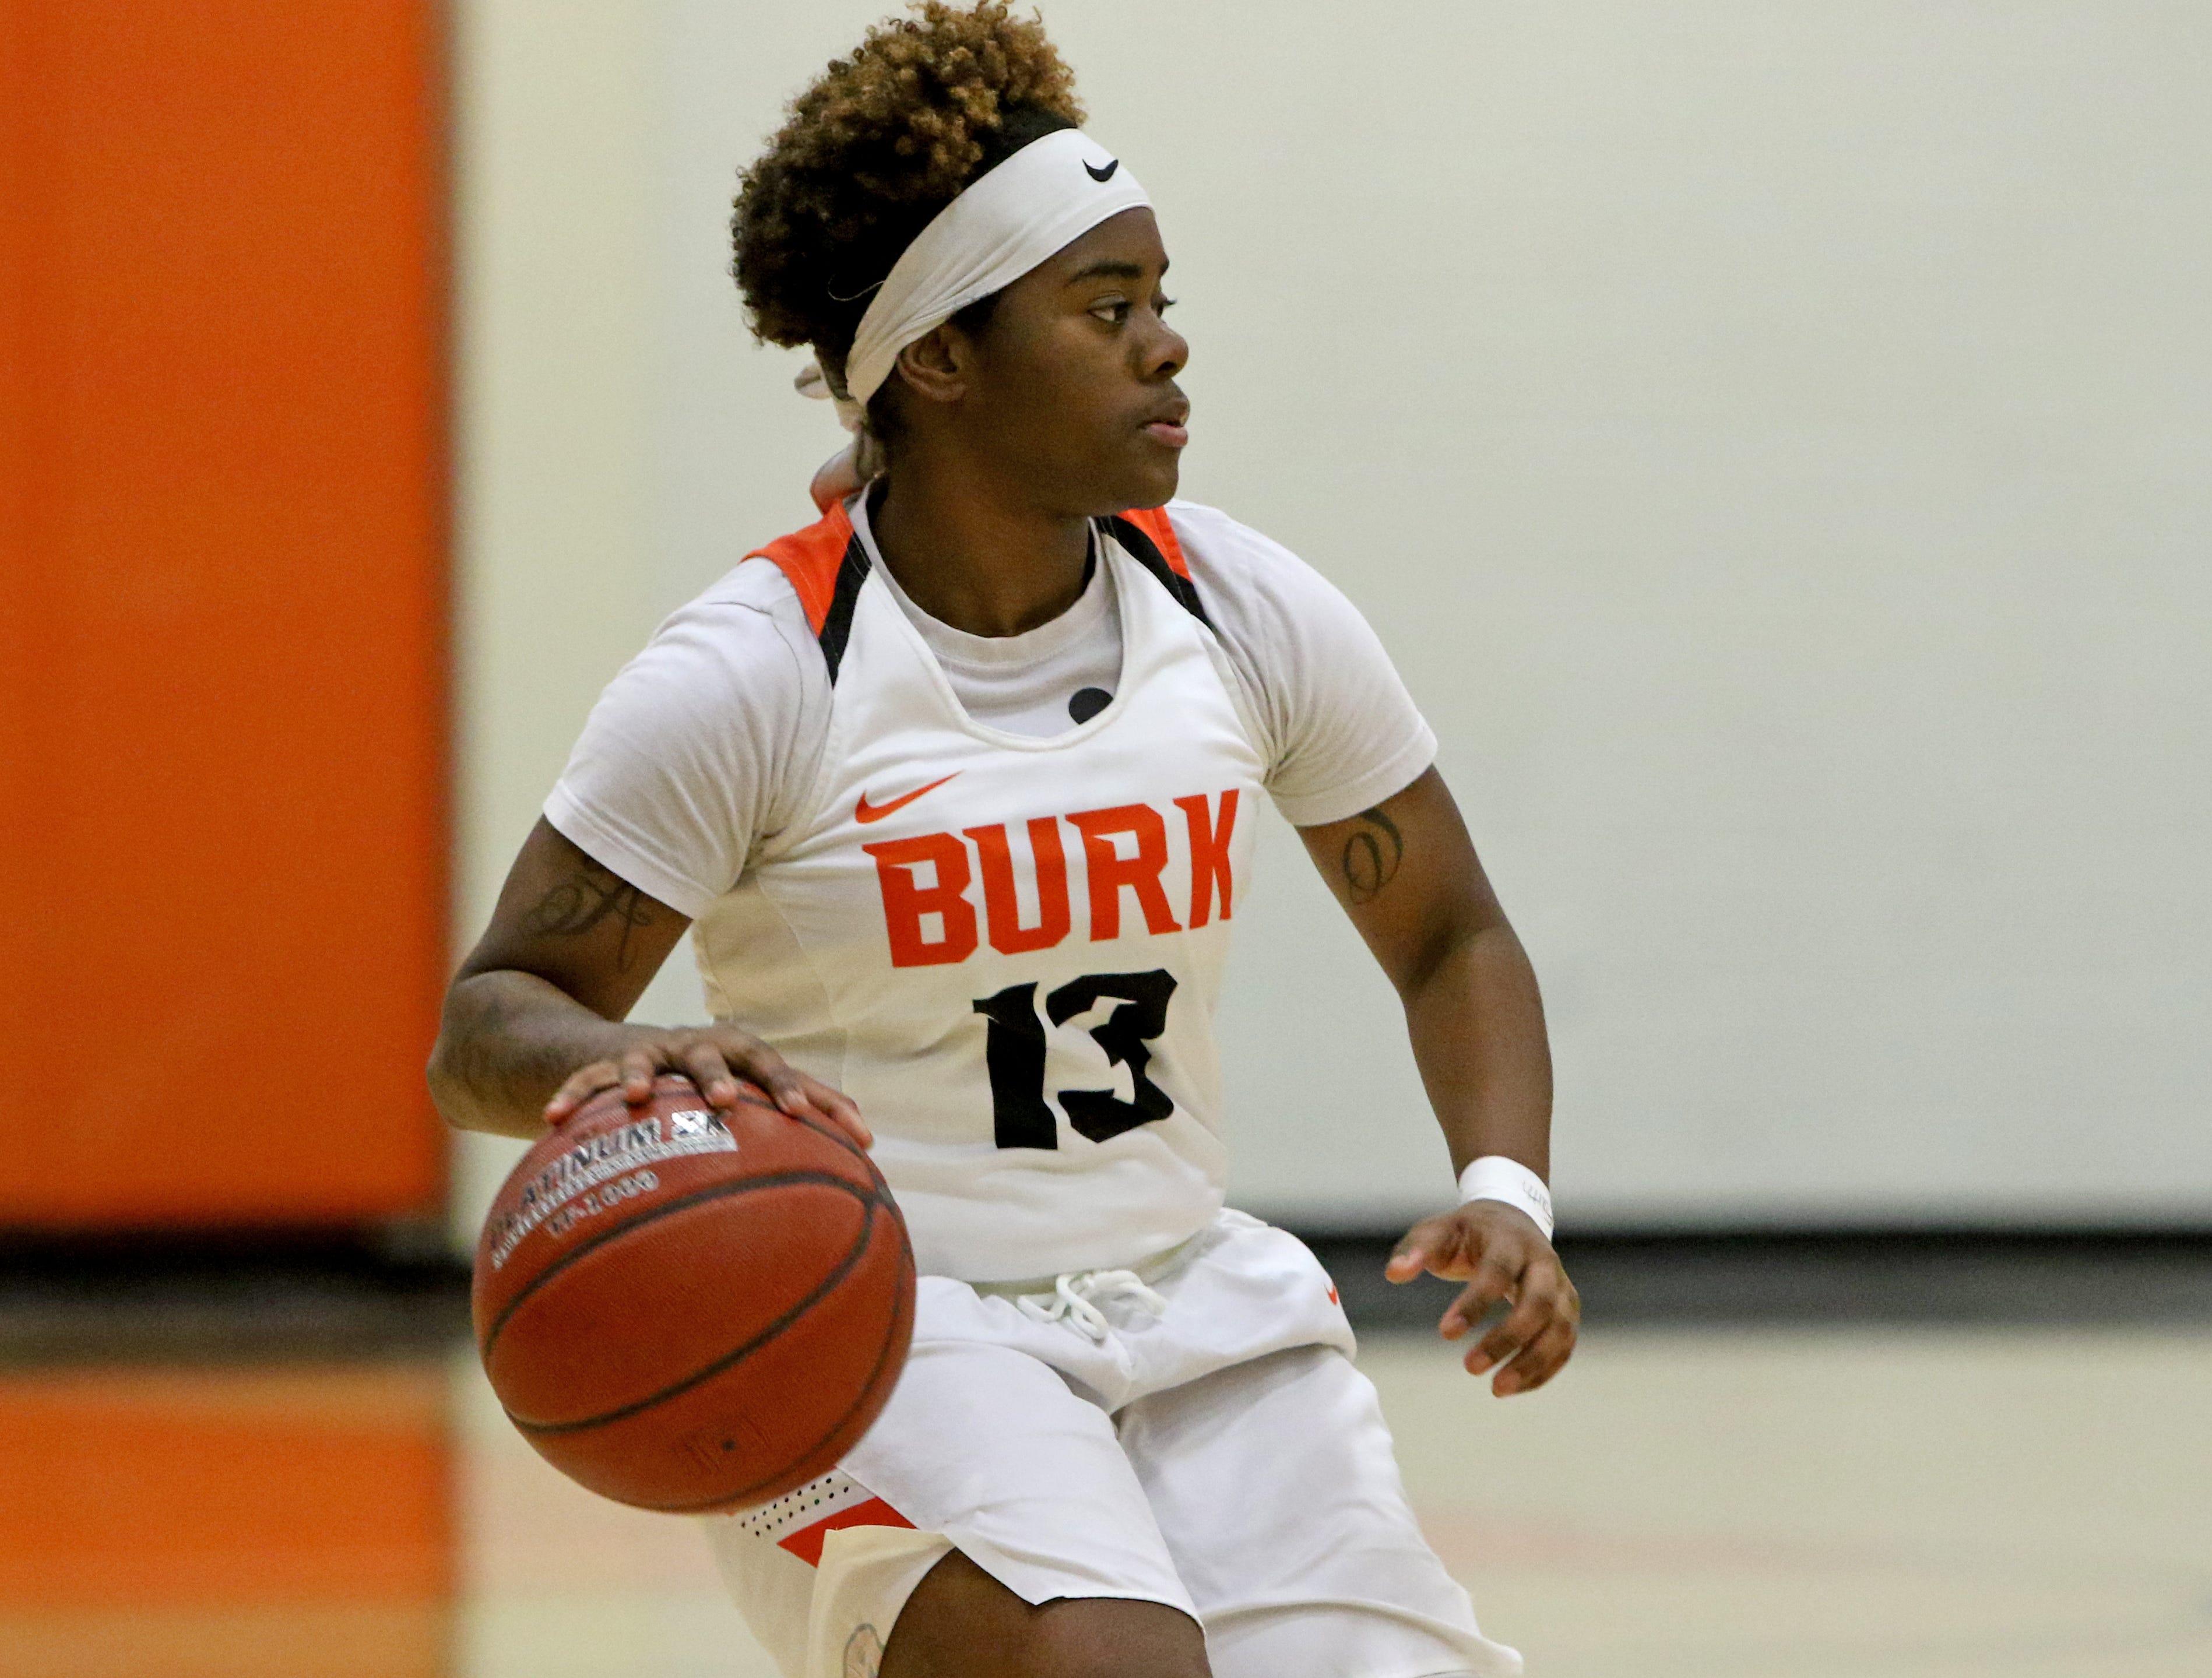 Burkburnett's Amiria Simoson dribbles in the game against Nocona Tuesday, Dec. 4, 2018, in Burkburnett.